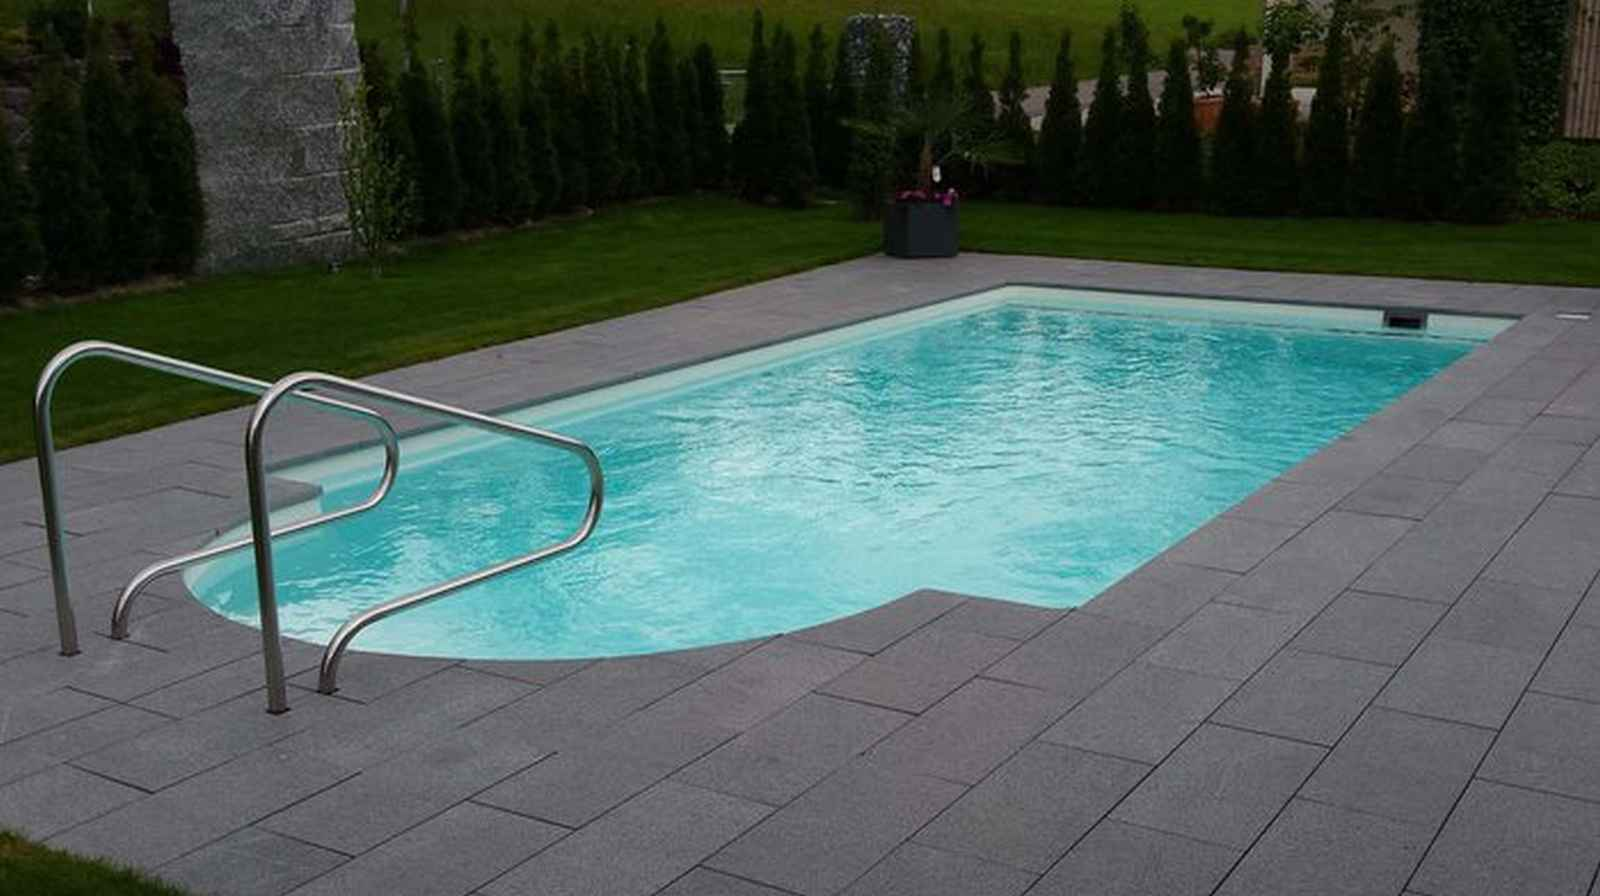 Modell elba 62 schwimmbadtechnik frankfurt - Pool mit stahlrahmen ...